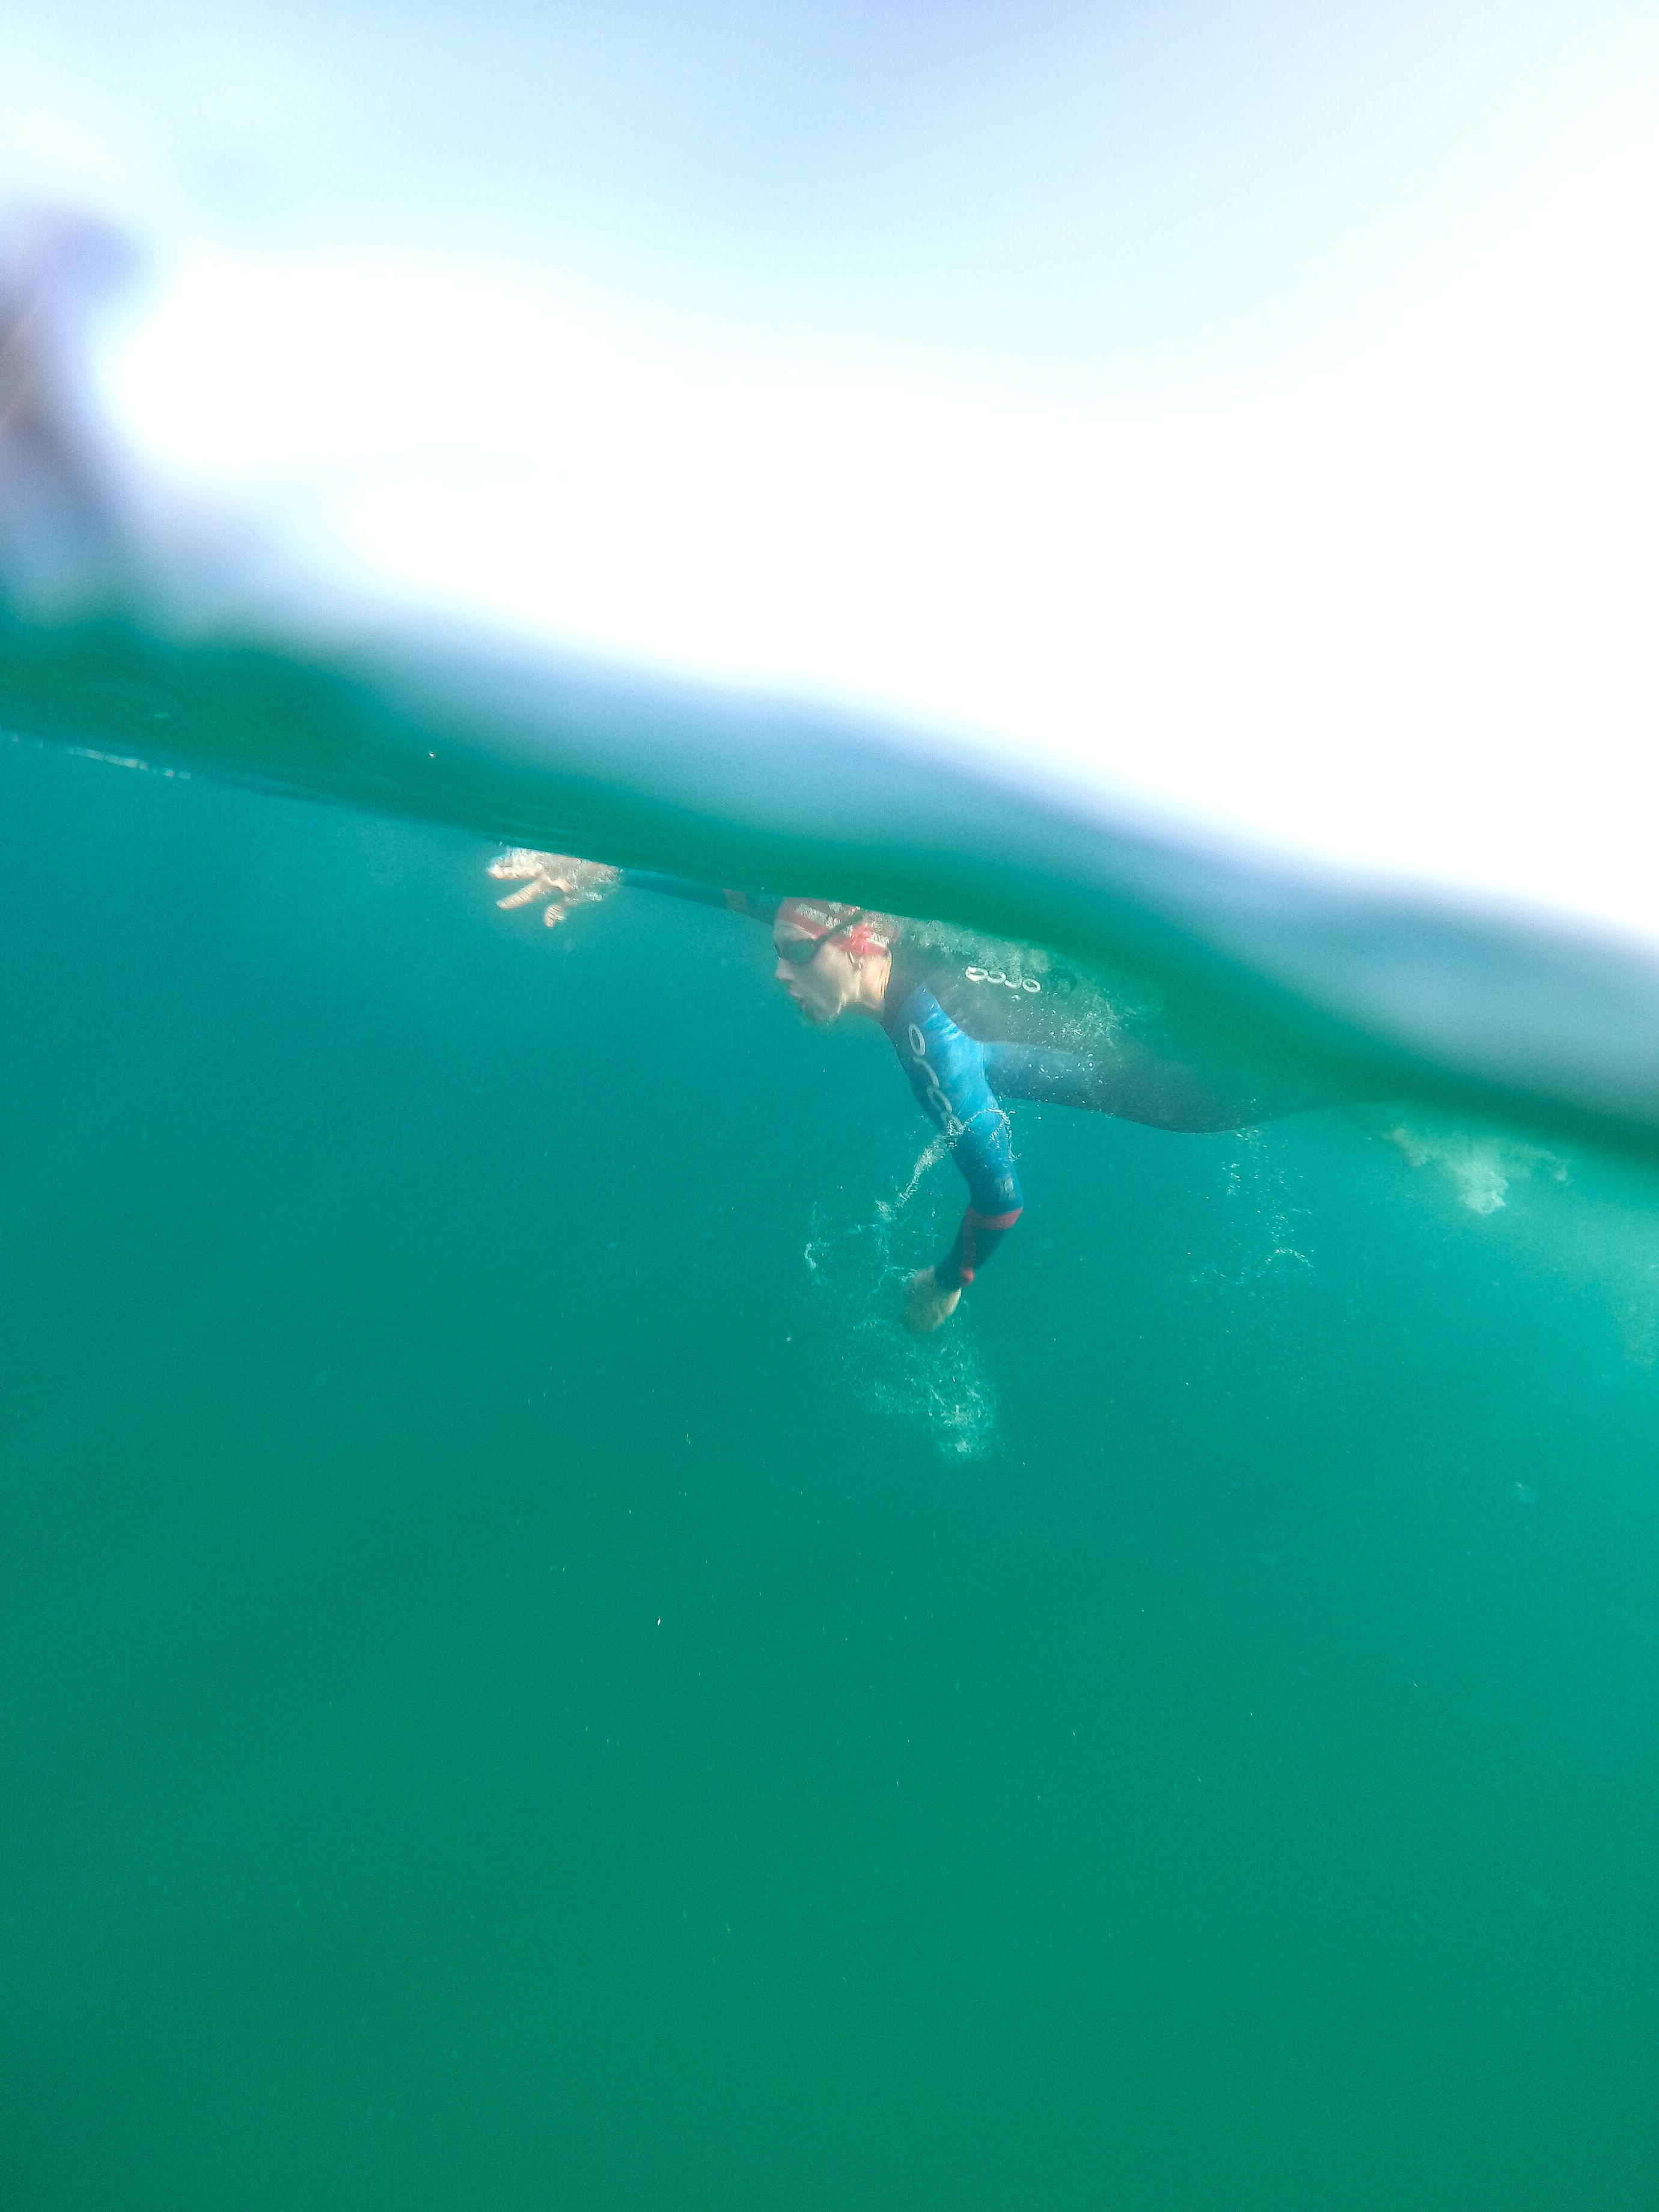 Plymouth Breakwater Swim - cover image